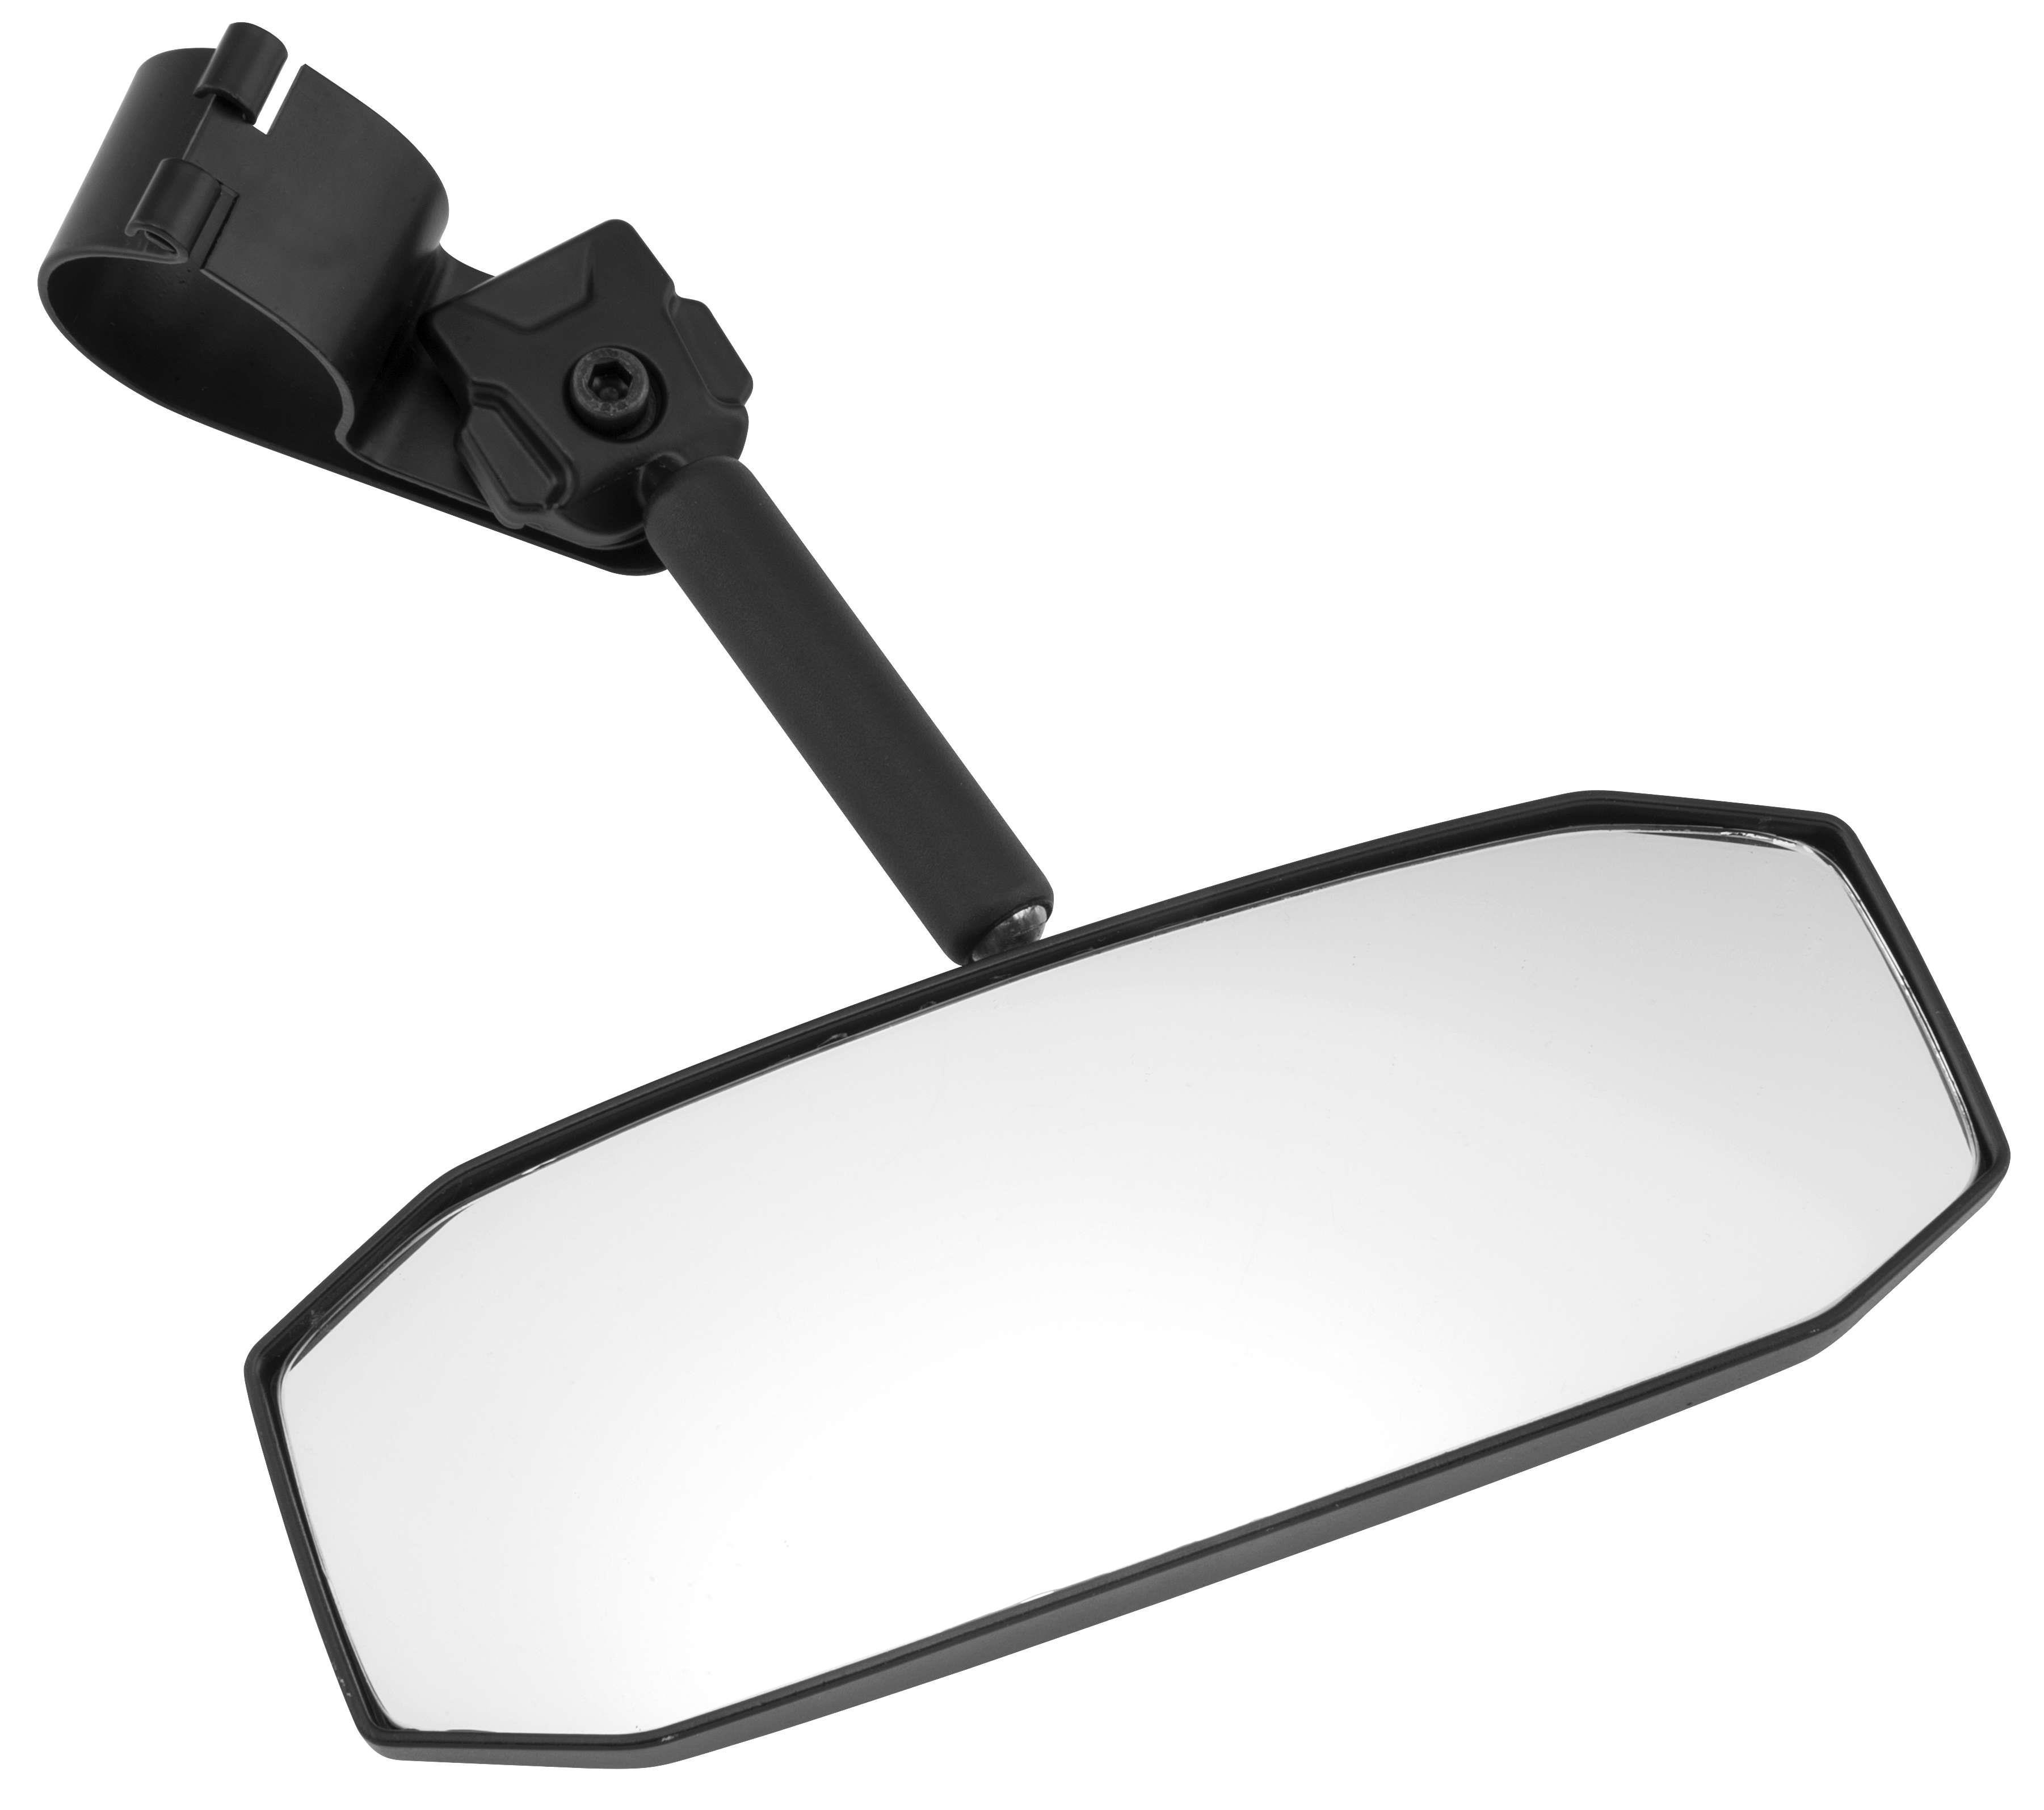 QuadBoss 18054T Rear View Mirror Polaris Pro Fit by QuadBoss